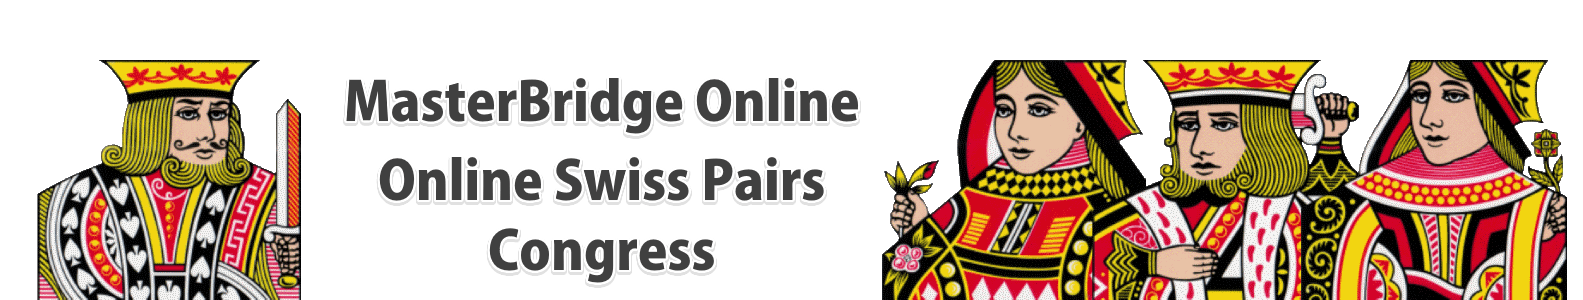 MasterBridge Online Swiss Pairs Congress Information Page